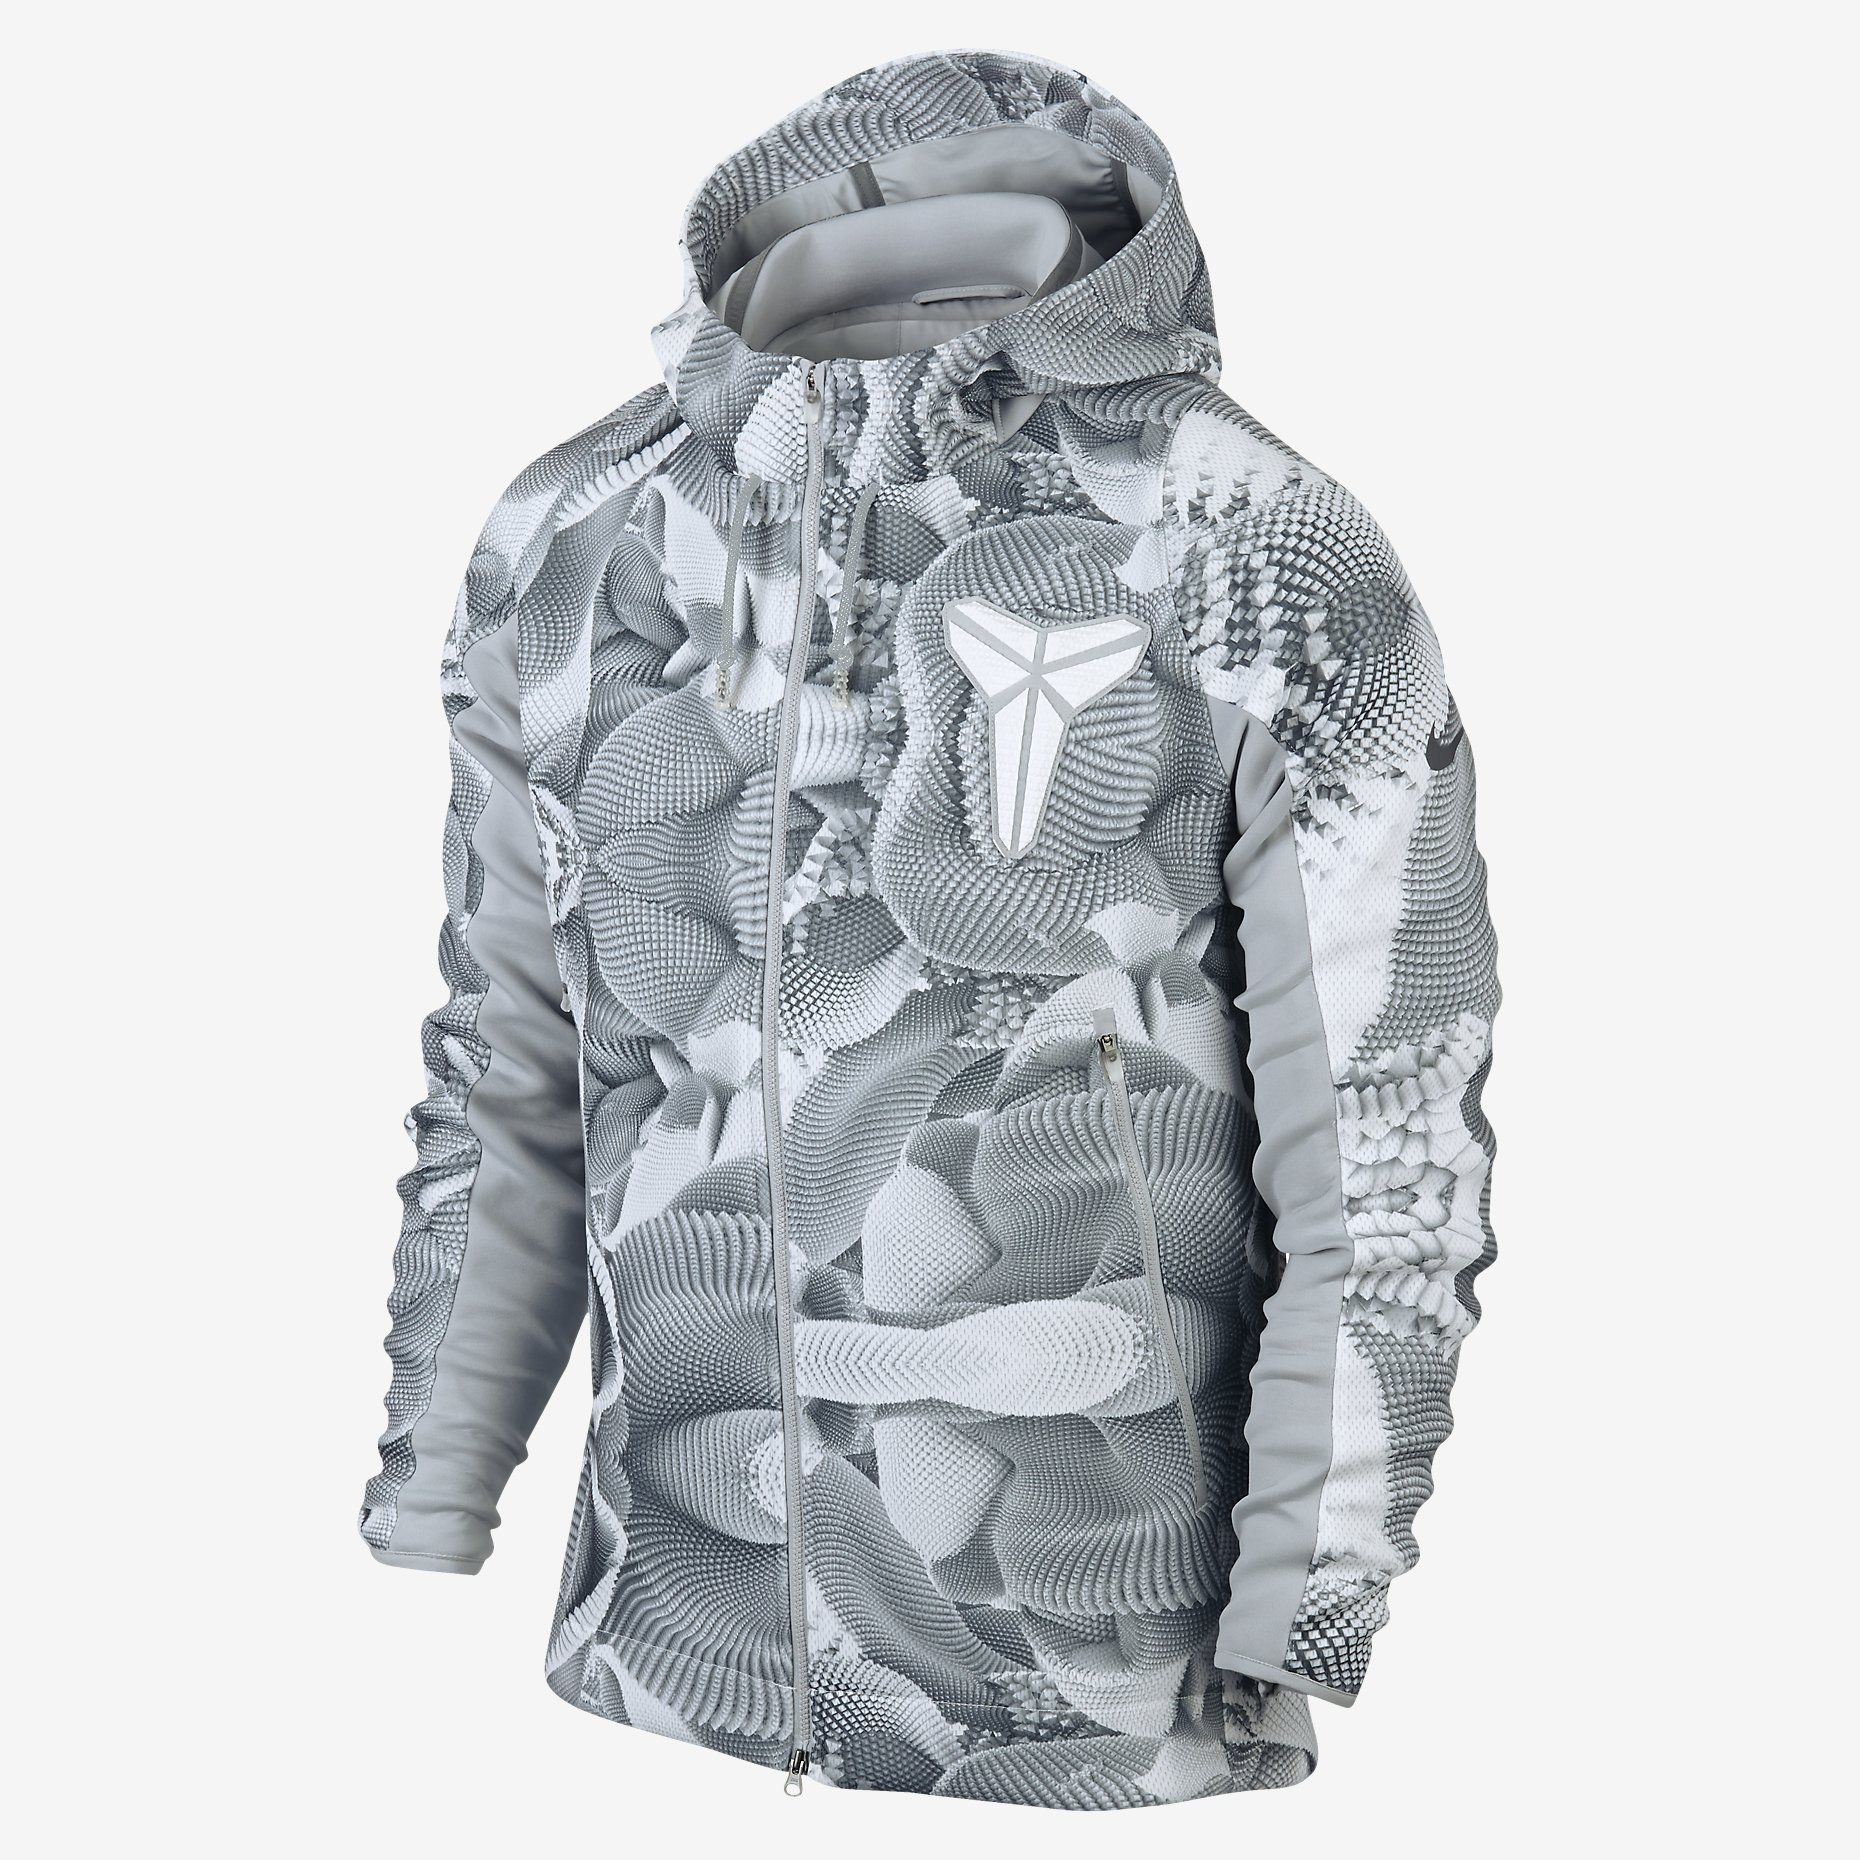 nike kobe mambula hypermesh jacket Sale